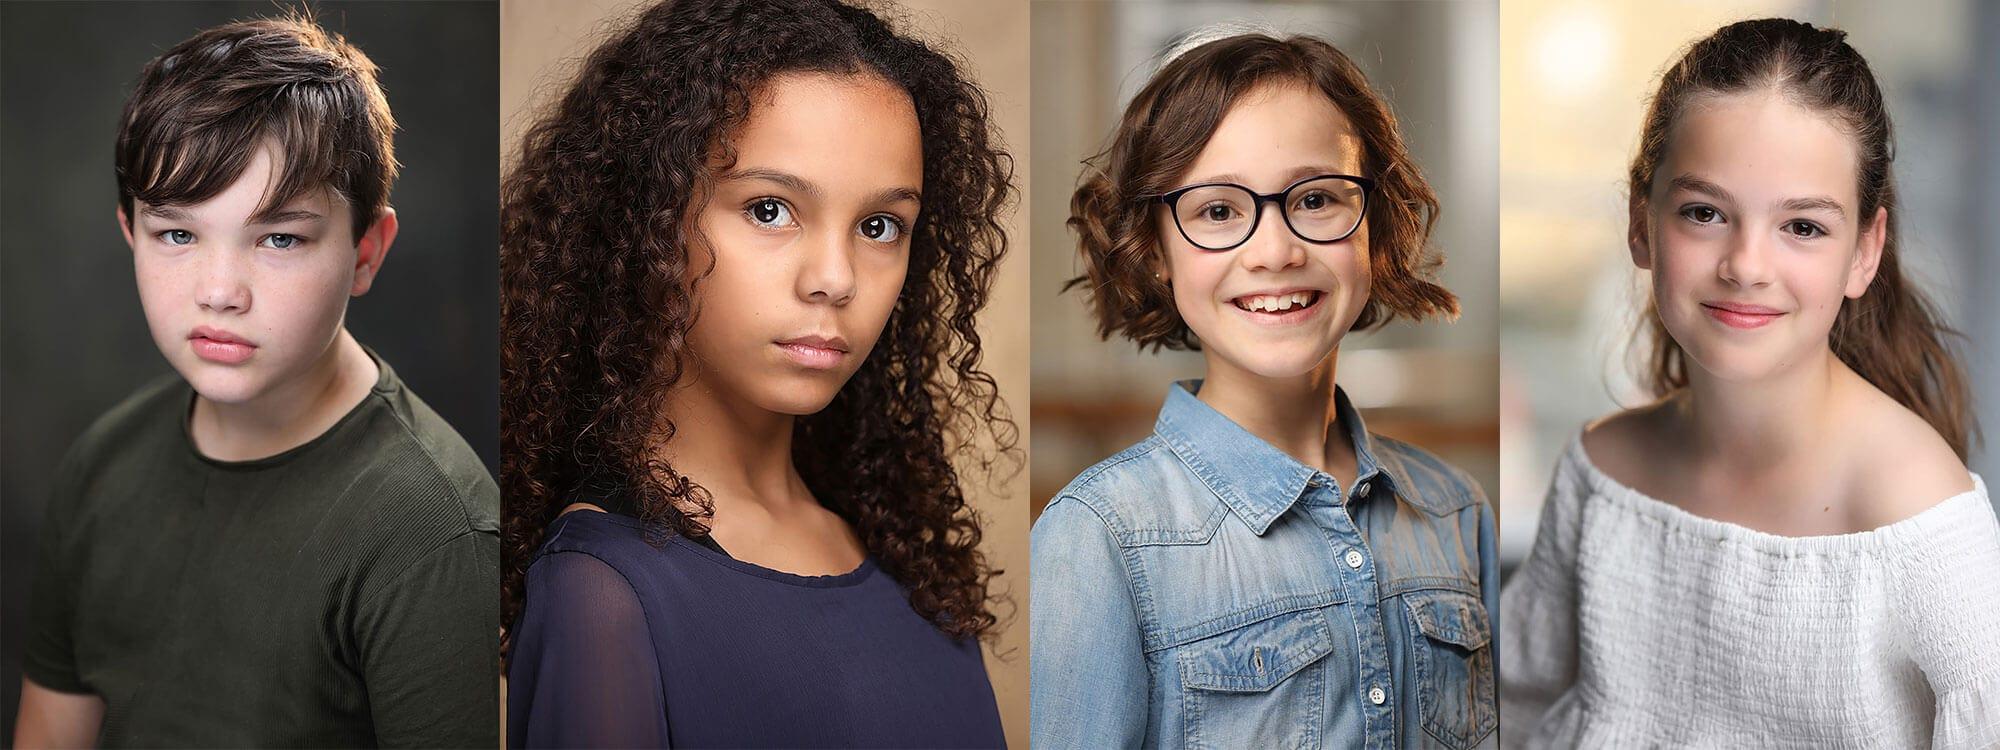 Child Actor Headshot Photographer